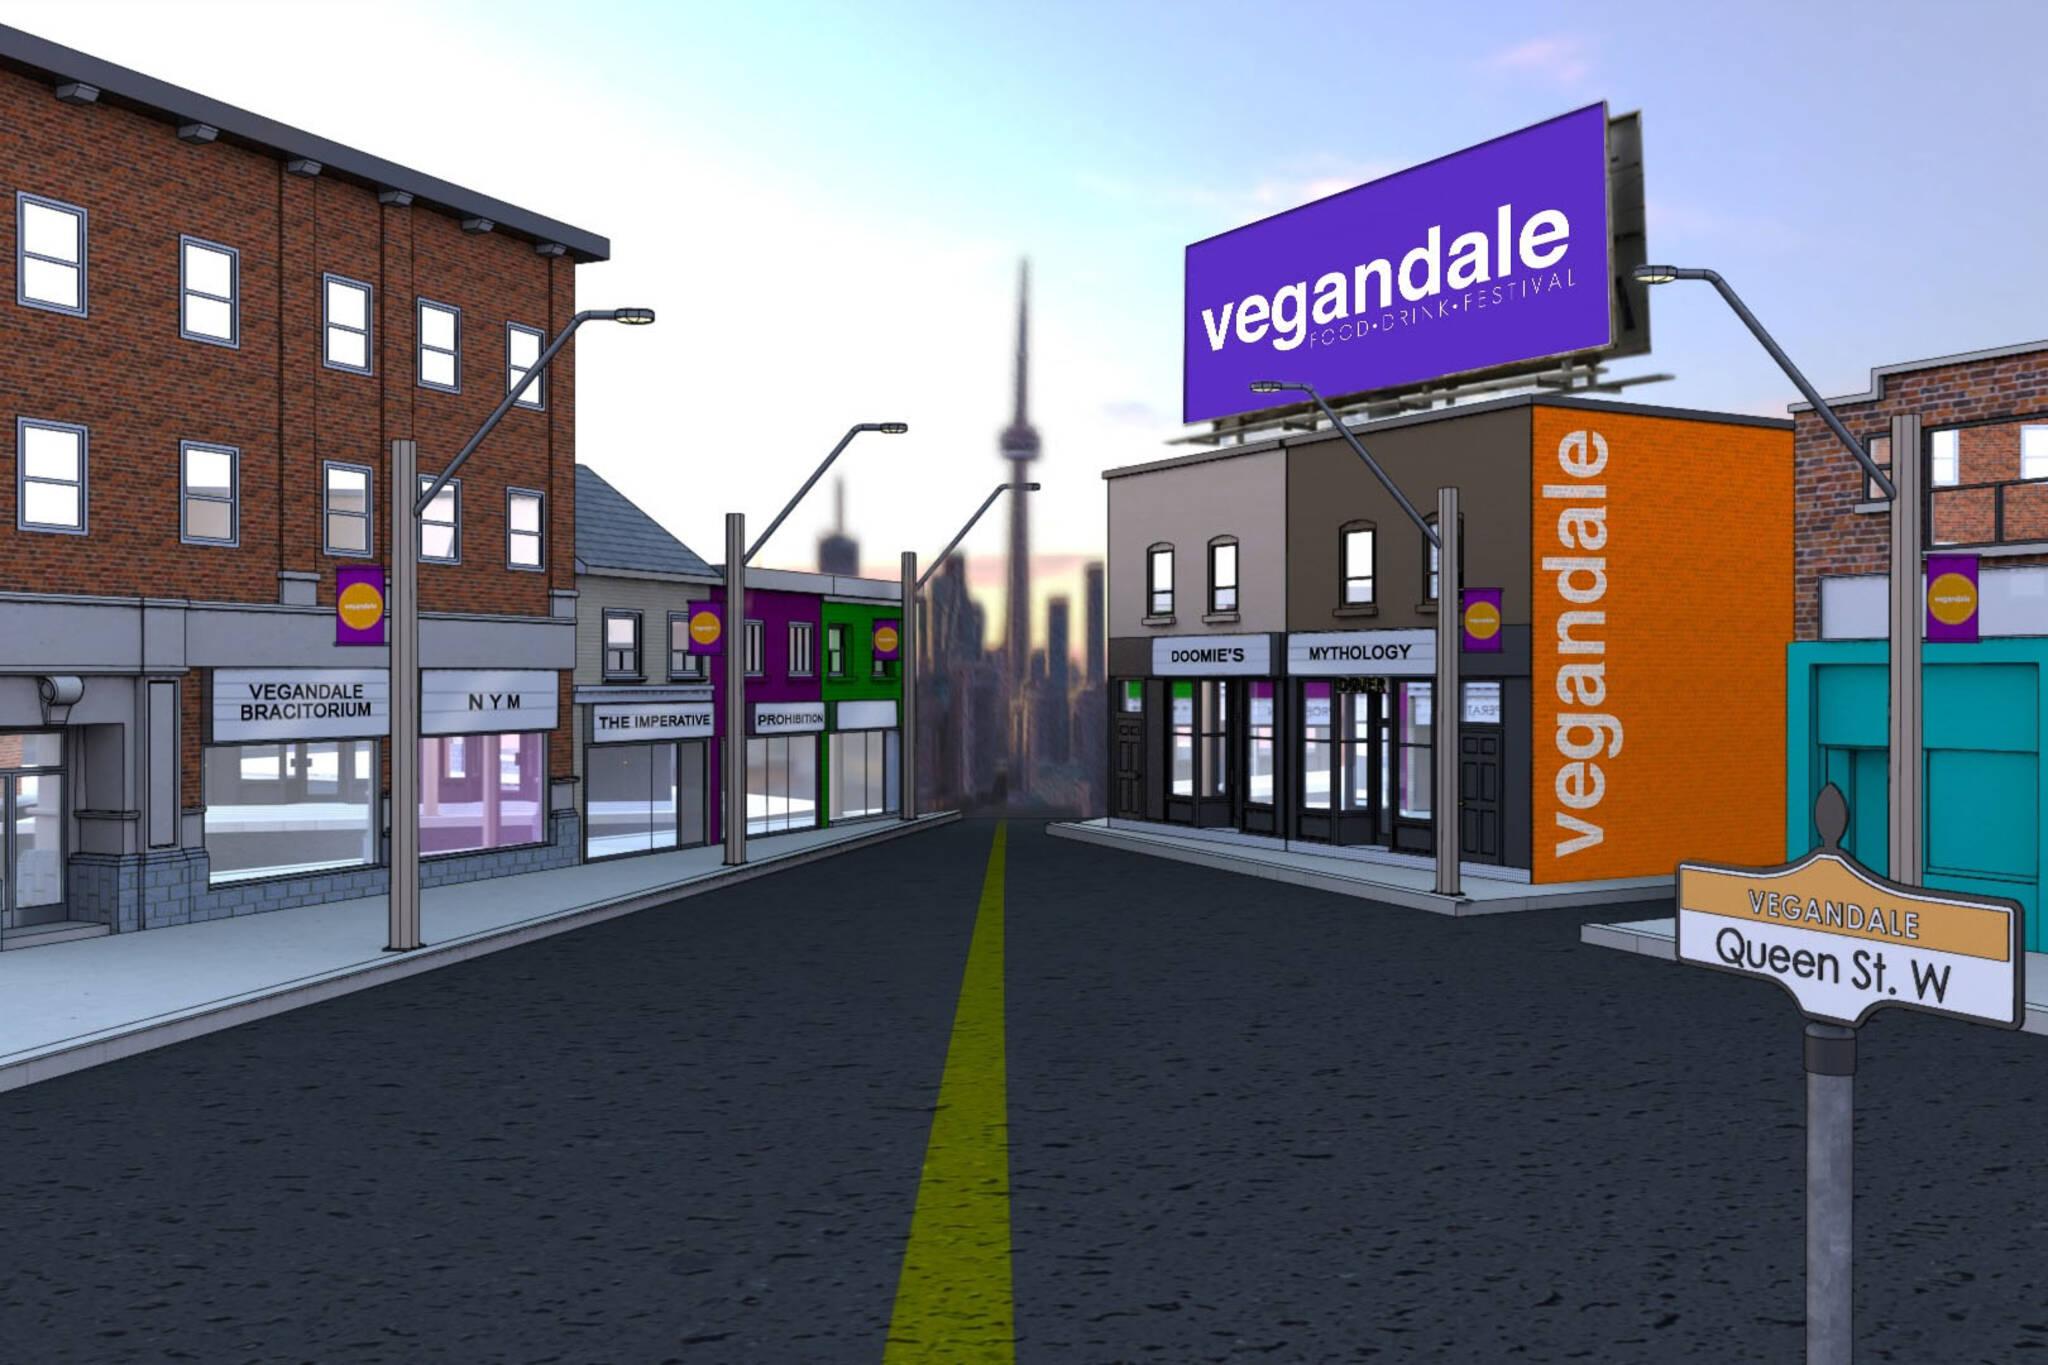 Vegandale Toronto